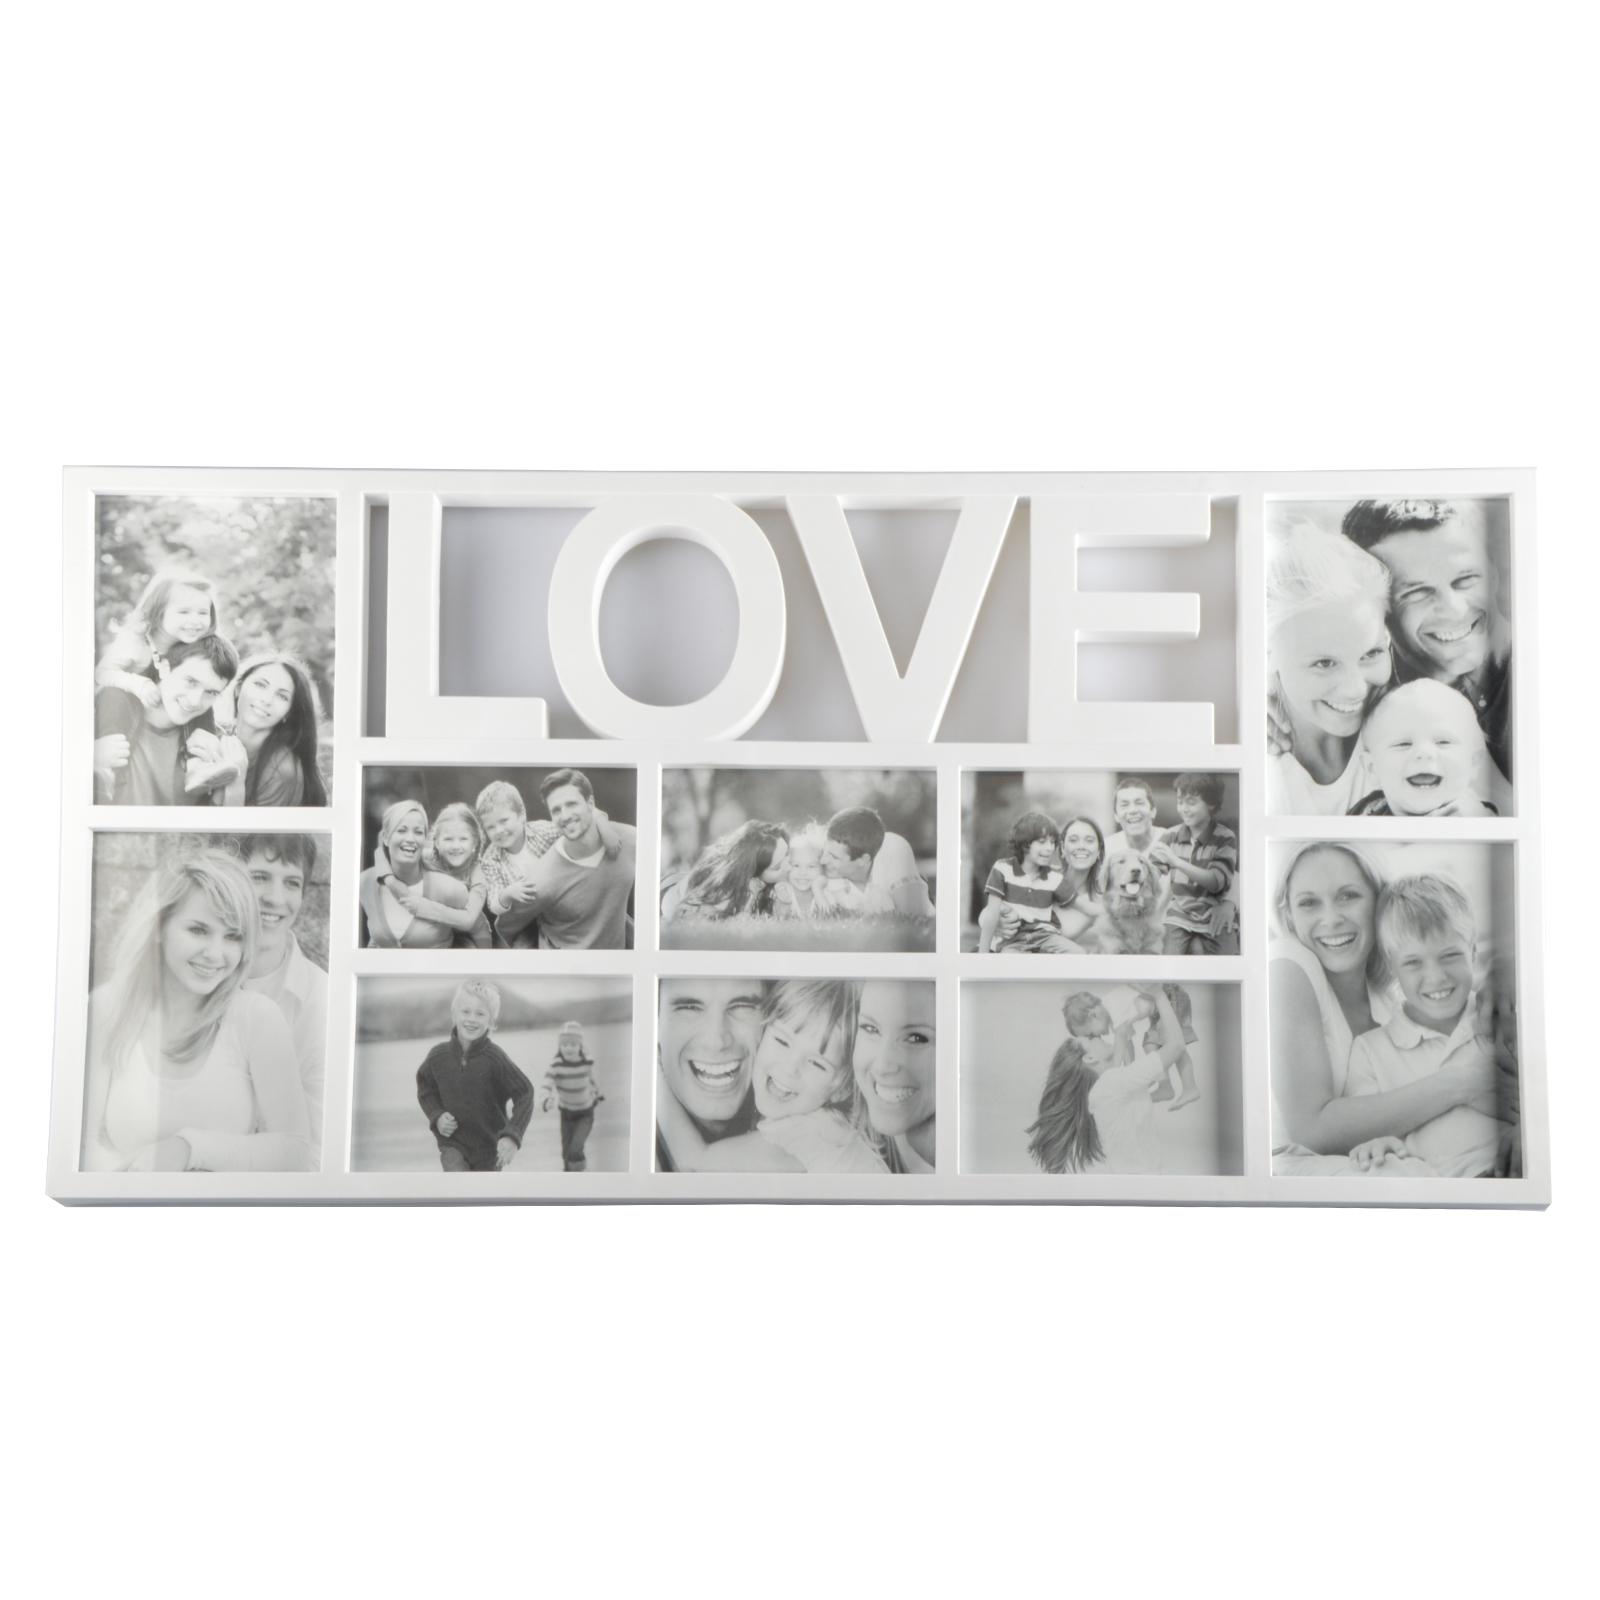 3 modelle 3d bilderrahmen fotorahmen fotocollage collage wei home love friends. Black Bedroom Furniture Sets. Home Design Ideas